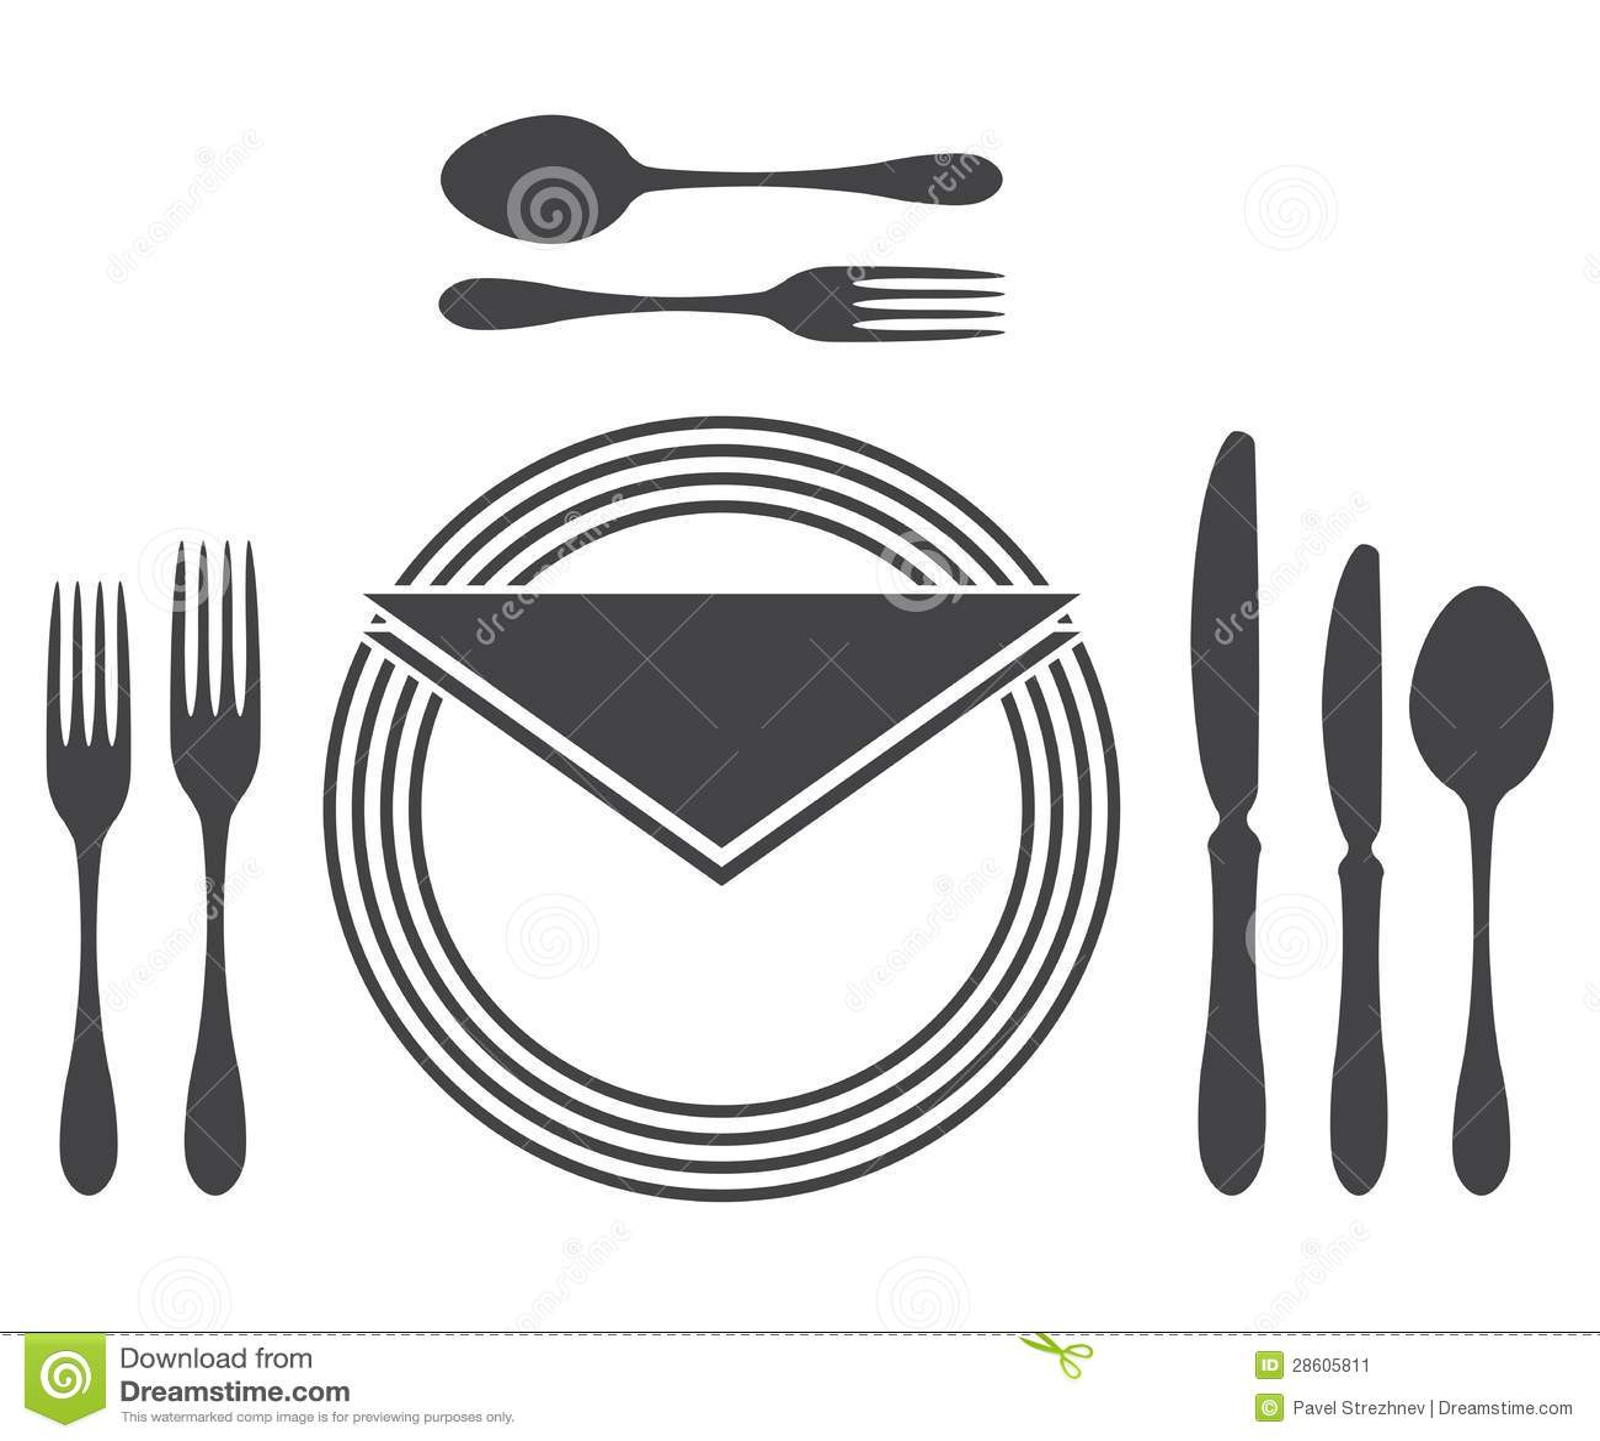 Etiquette Proper Table Setting Stock Image